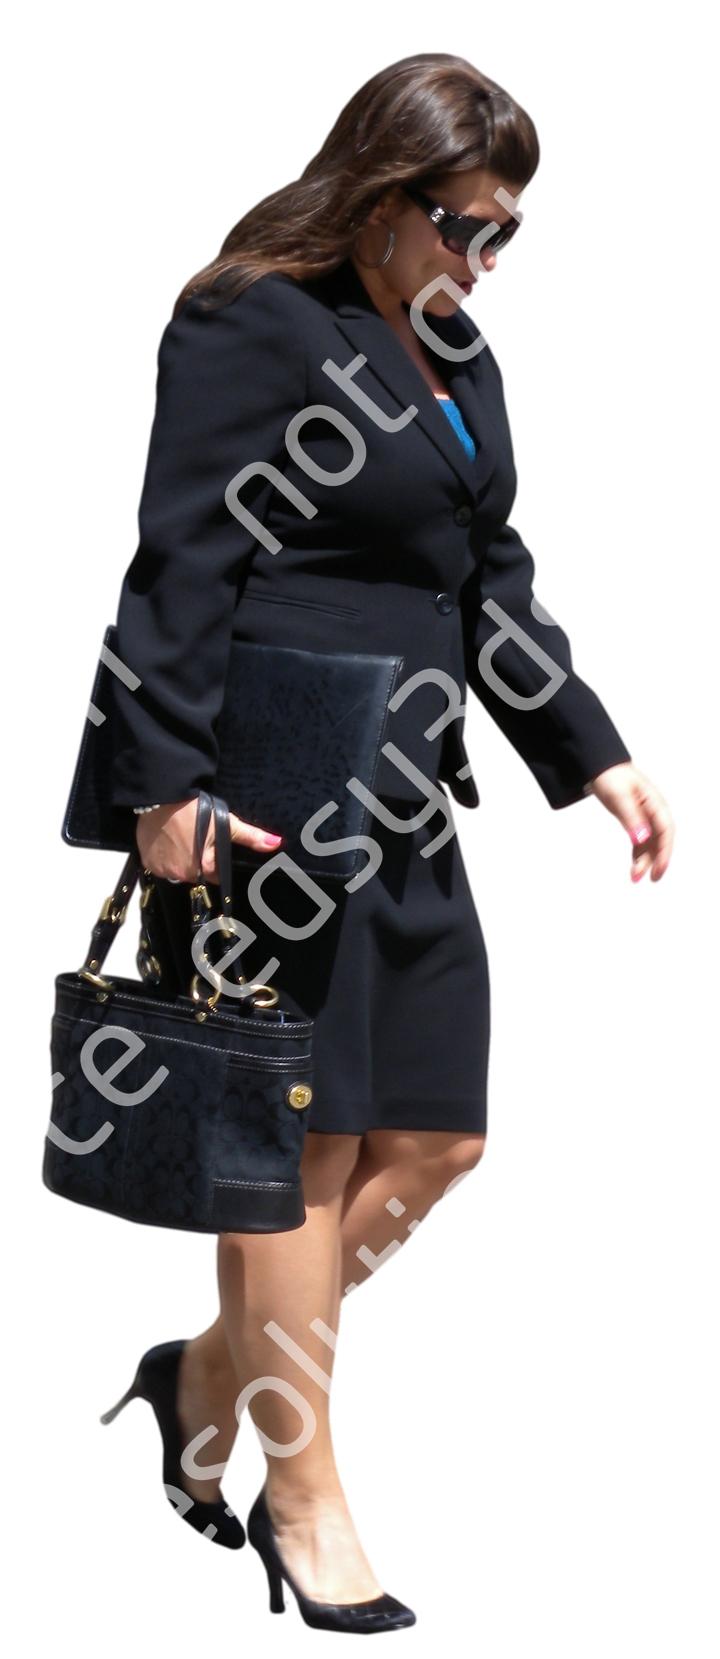 (Single) Business People V. 1 #054 woman, walking